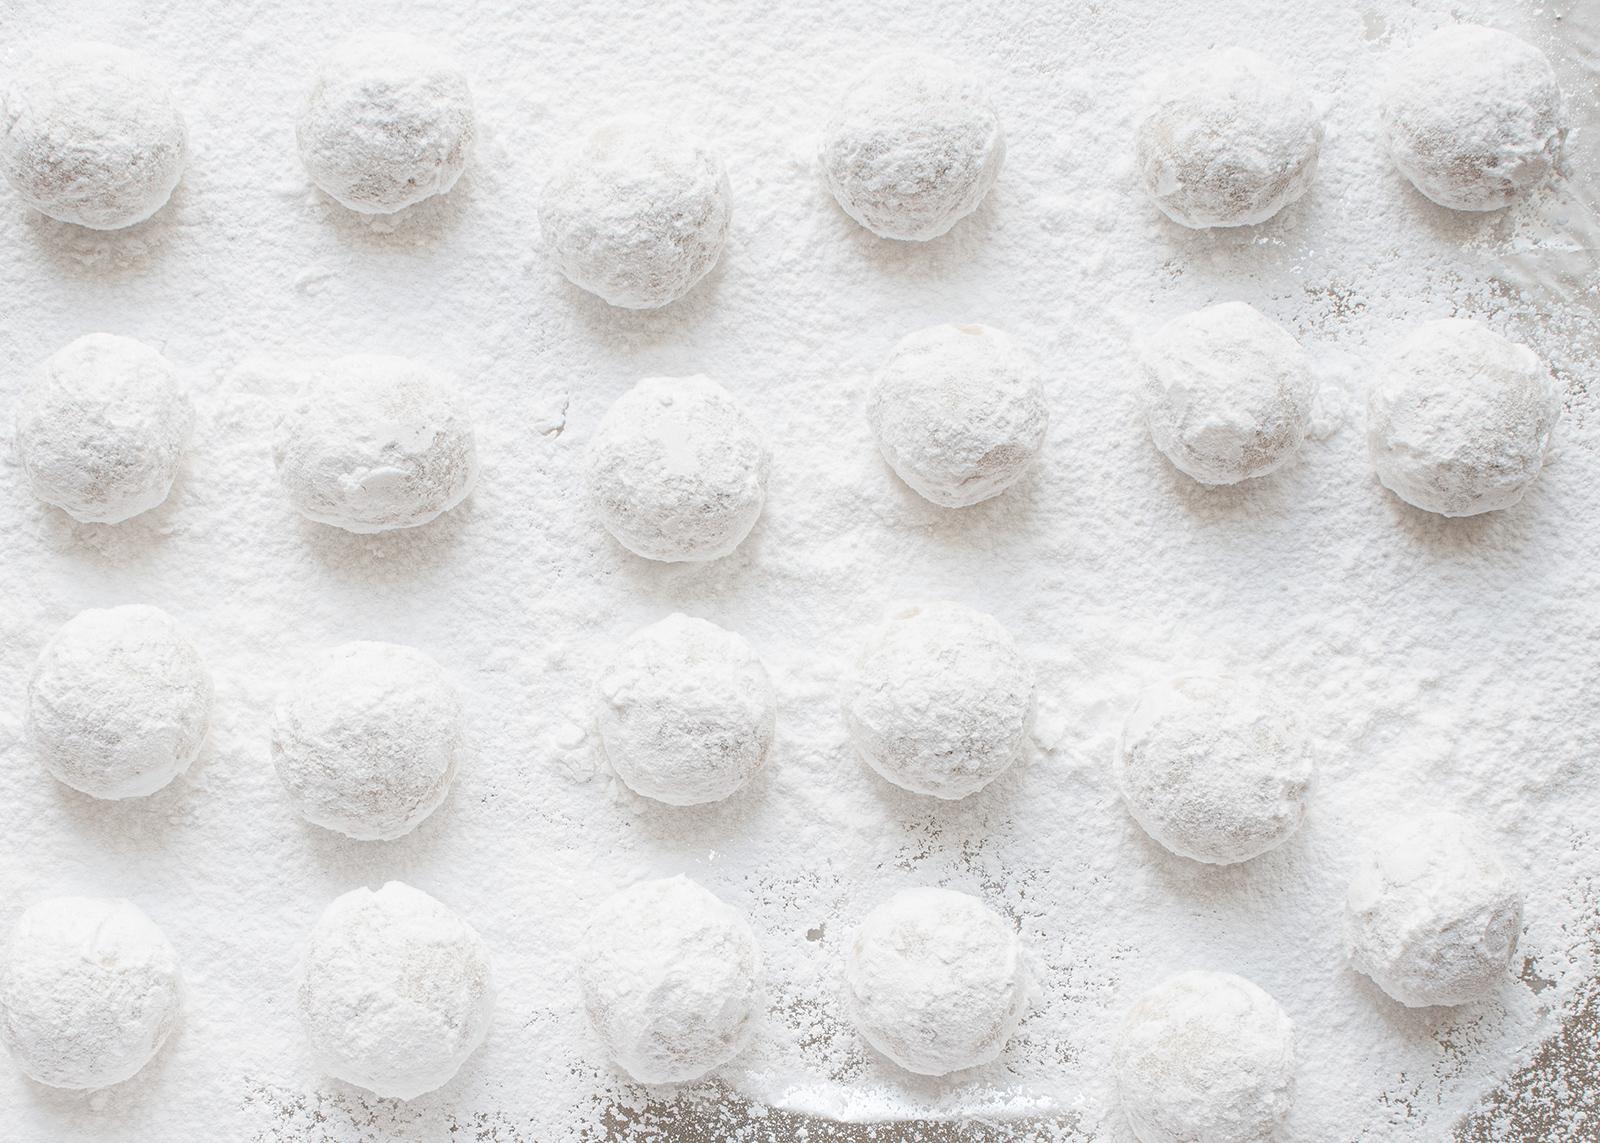 russian teacake cookies on a baking sheet